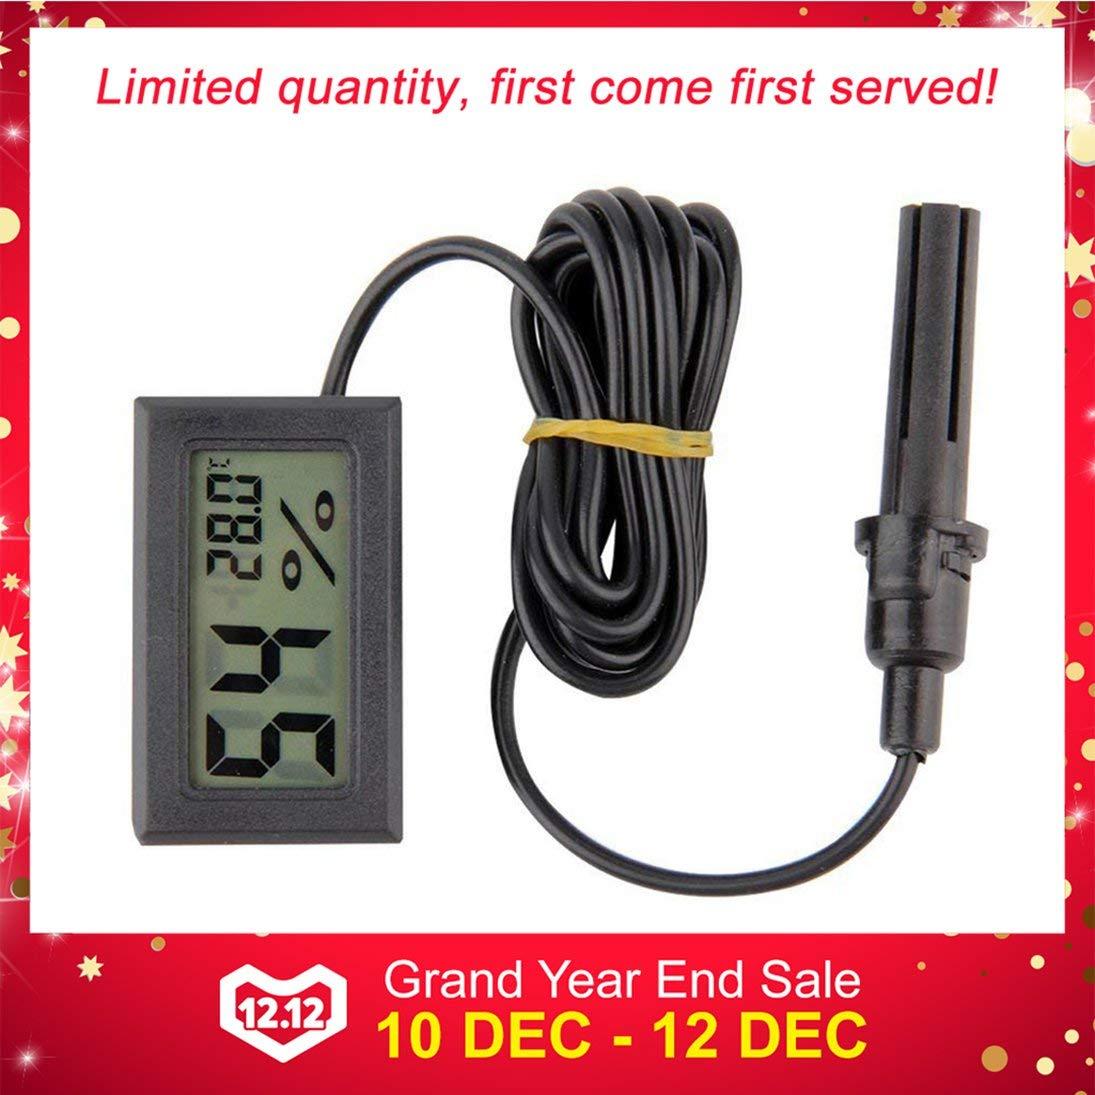 FY-12 Mini LED Digital Term/ómetro Higr/ómetro Temperatura Humedad Medida Probador Monitor Interior Autom/óvil Hogar ToGames-ES